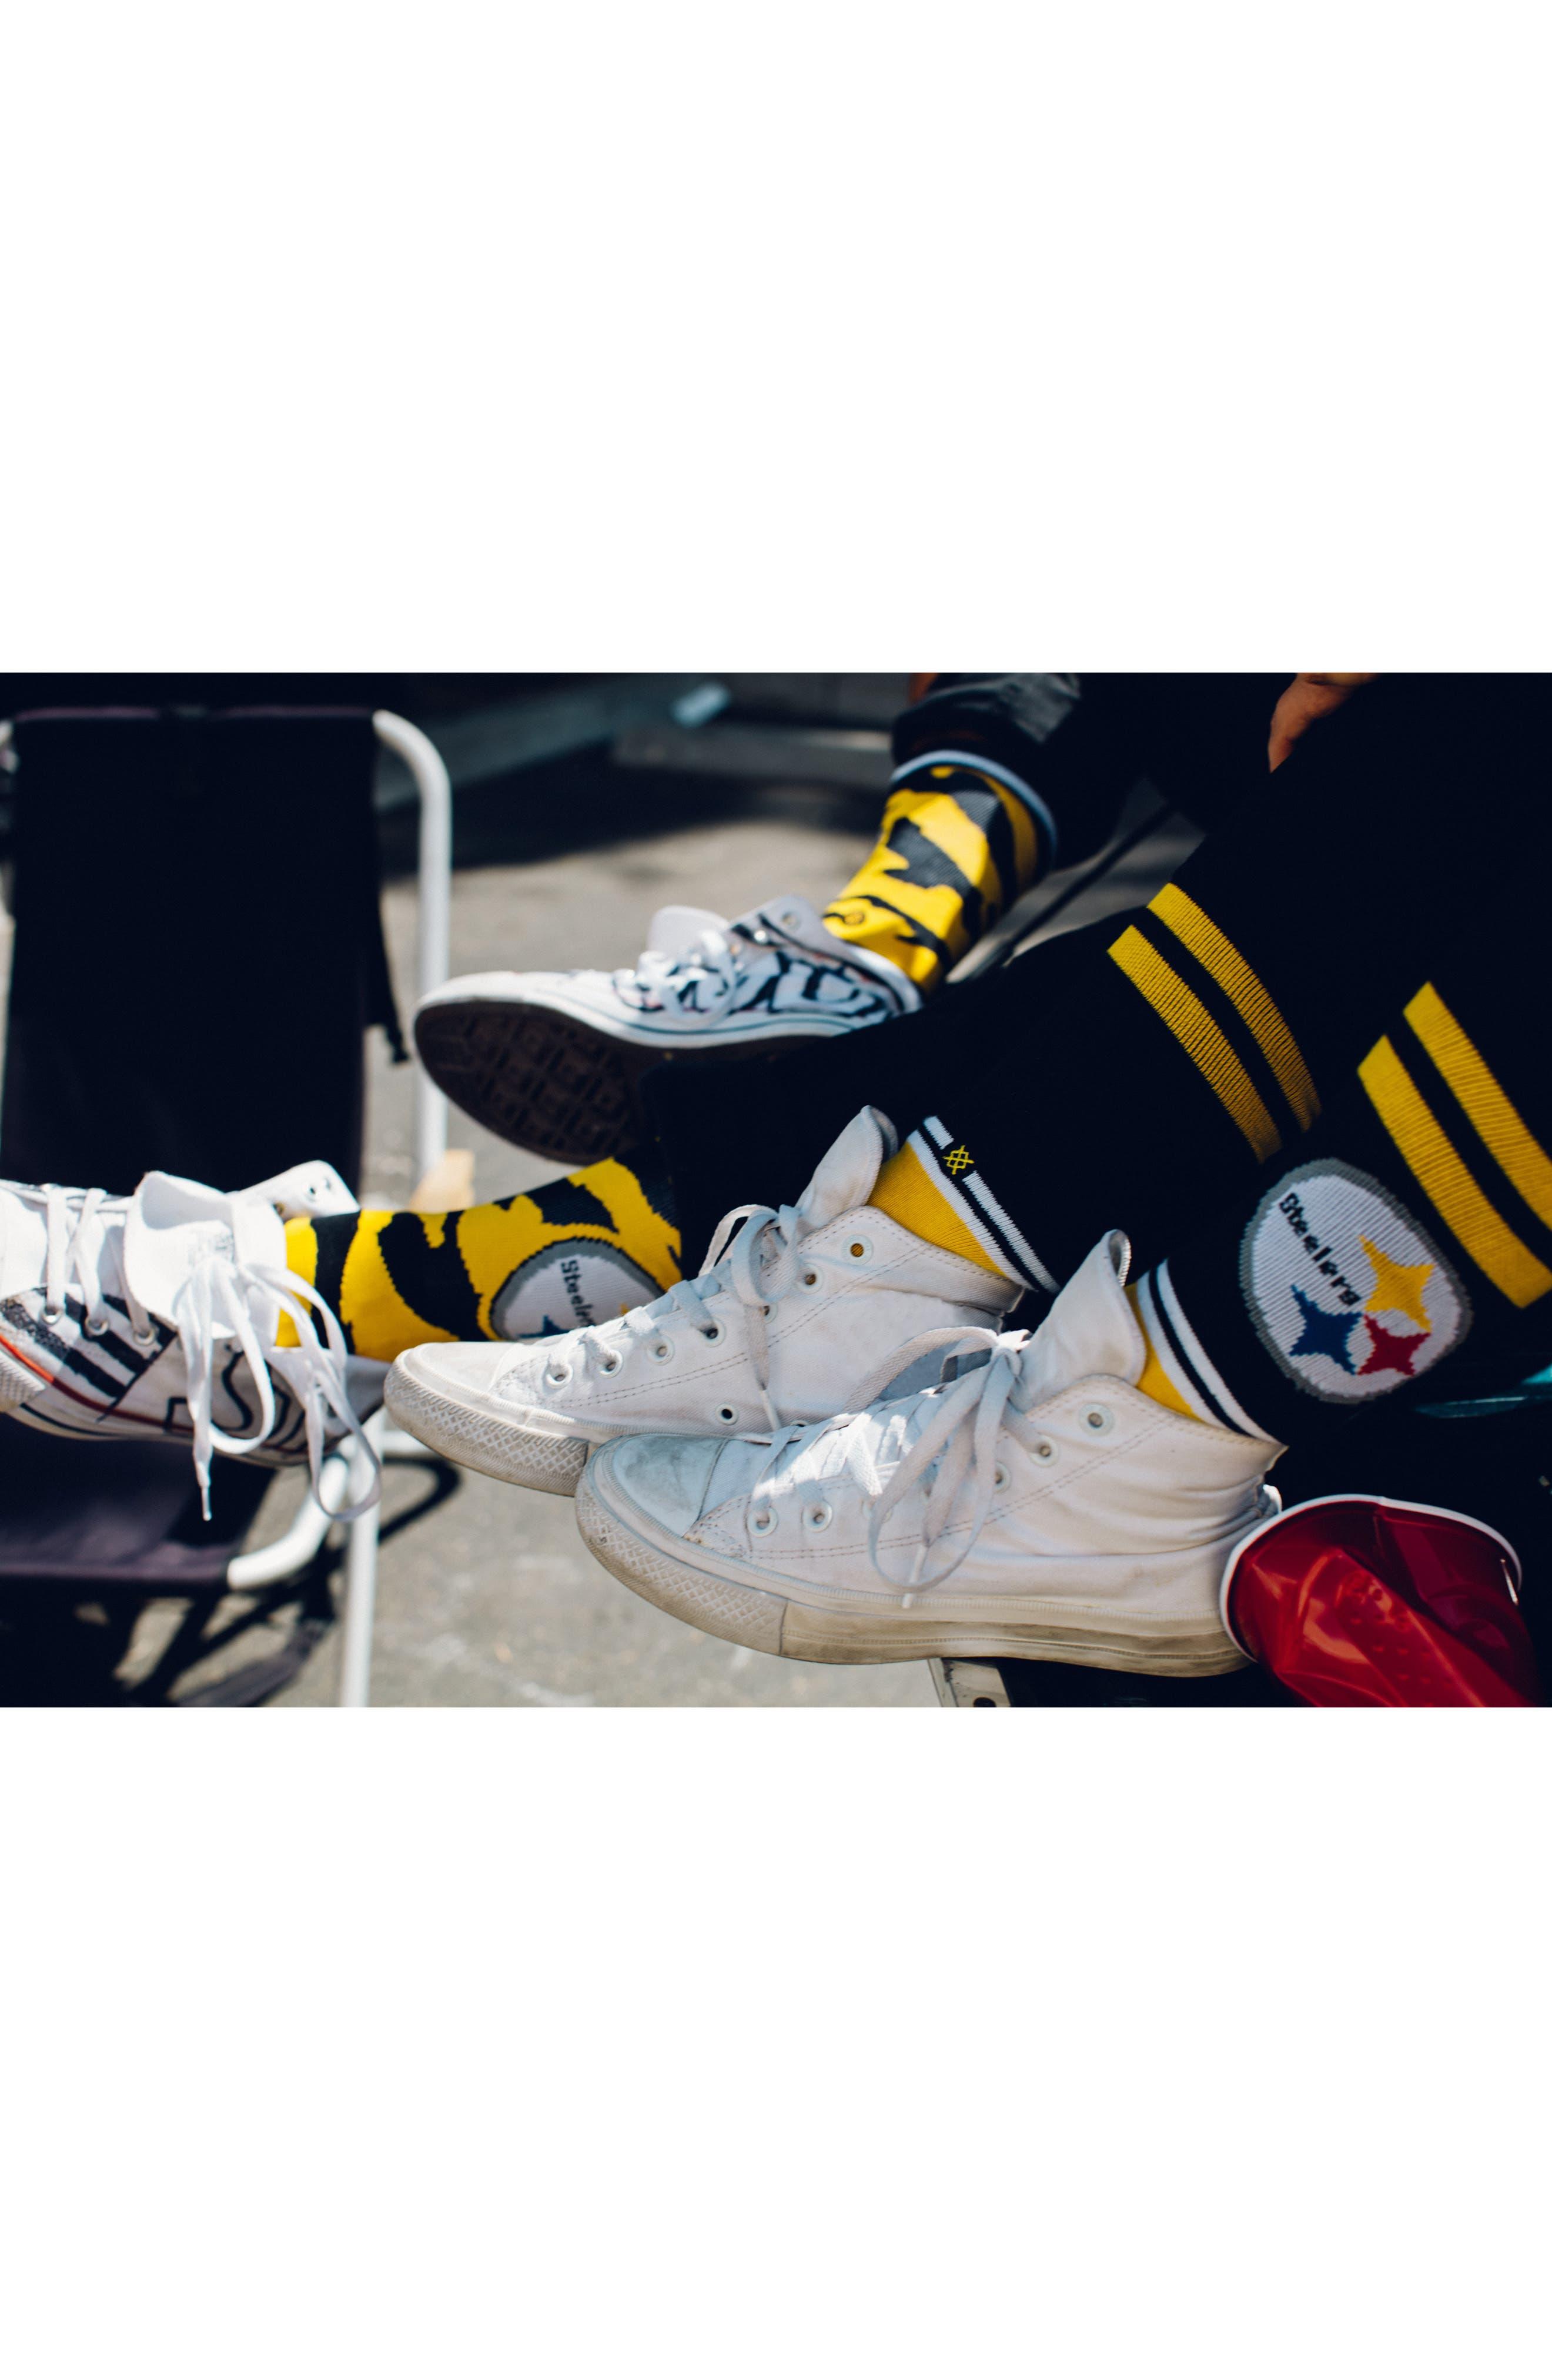 Pittsburgh Steelers - Fade Socks,                             Alternate thumbnail 8, color,                             700